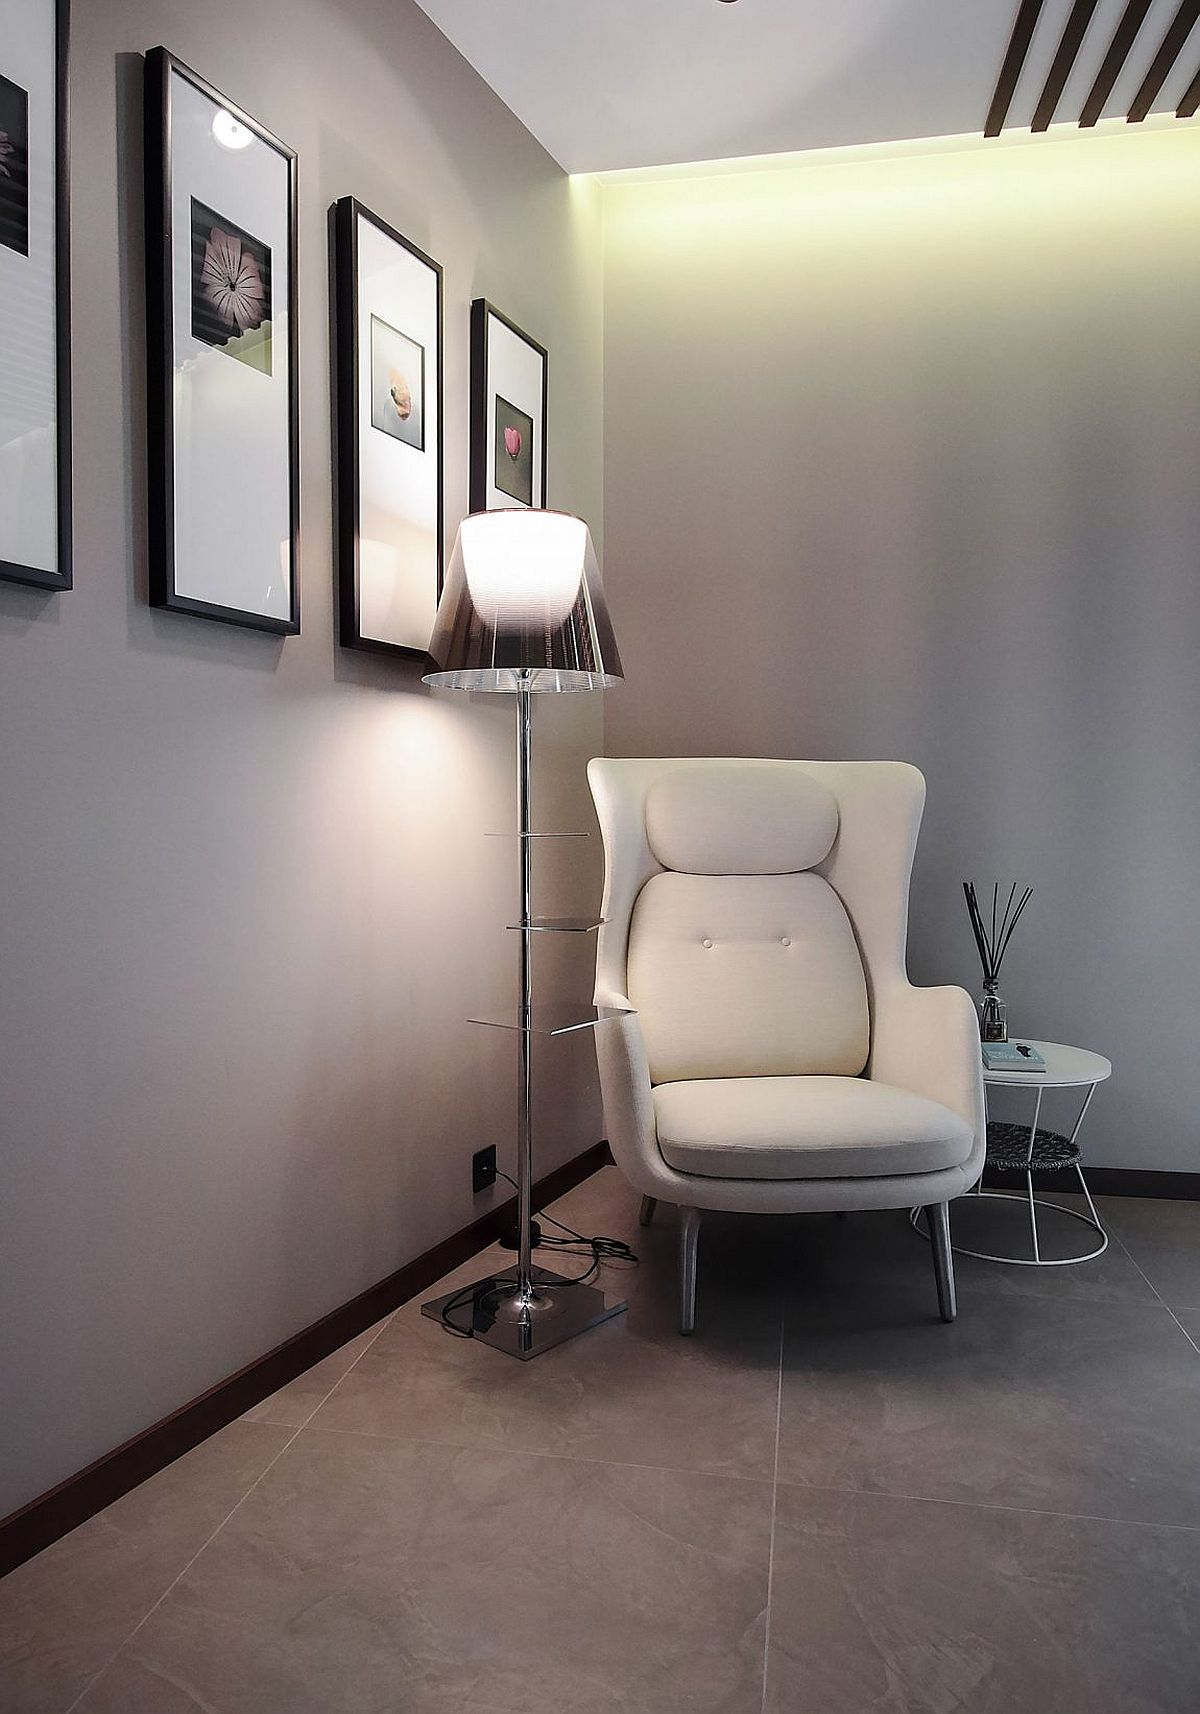 Floor lamp adds Hollywood Regency glam to the bathroom